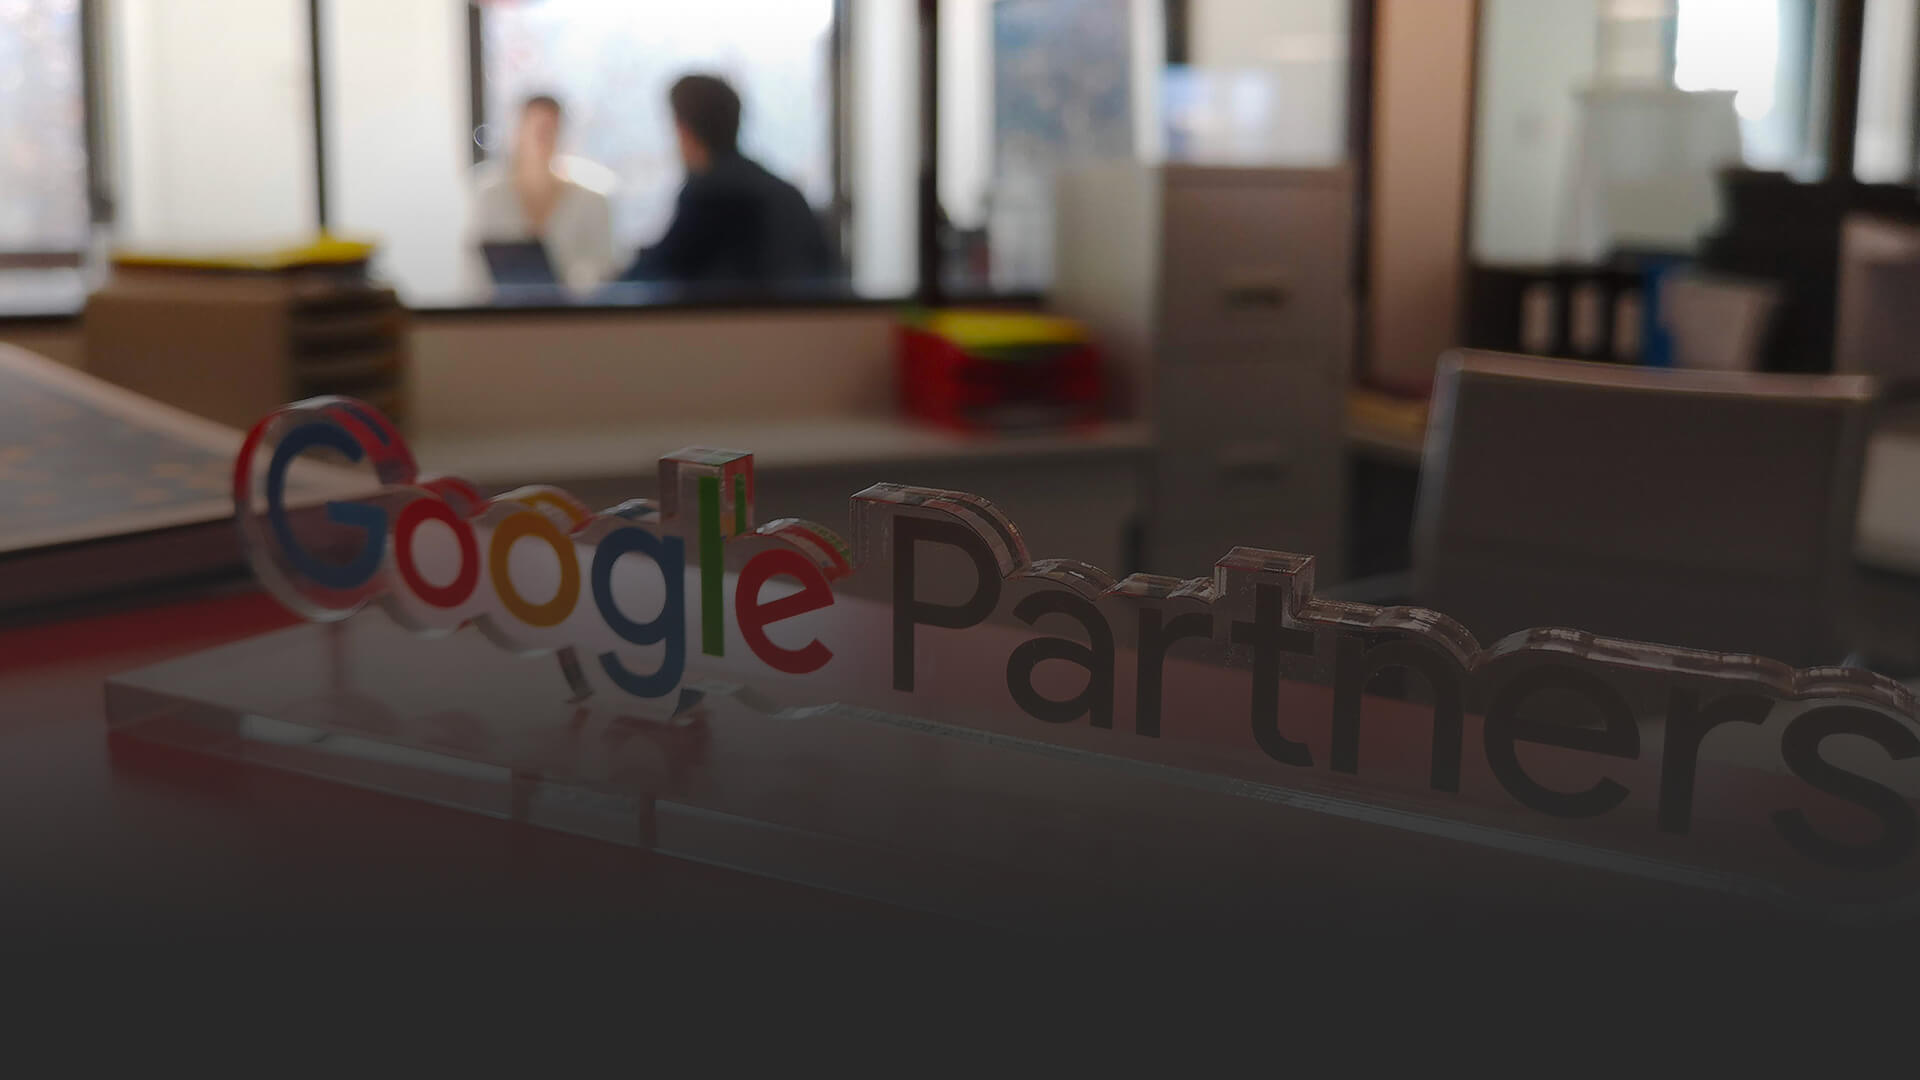 Agence SEO Google Partners